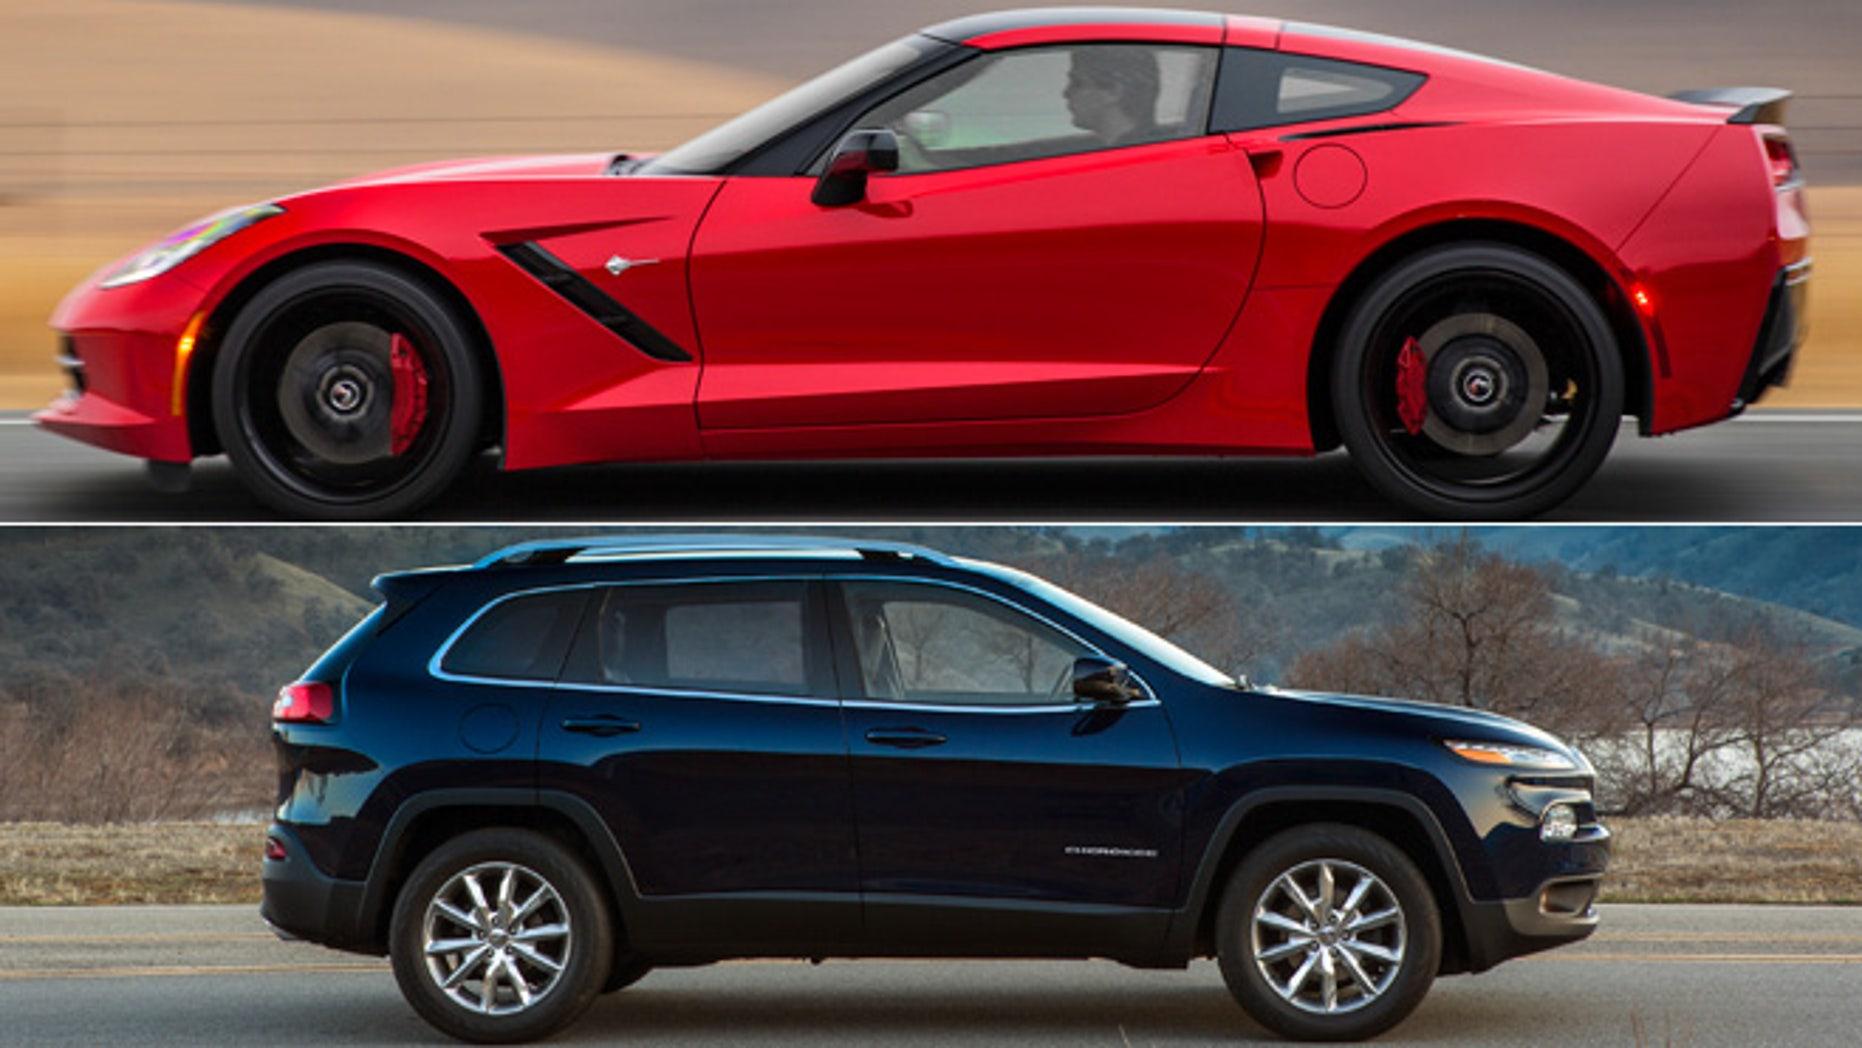 2014 Chevrolet Corvette Stingray/2014 Jeep Cherokee